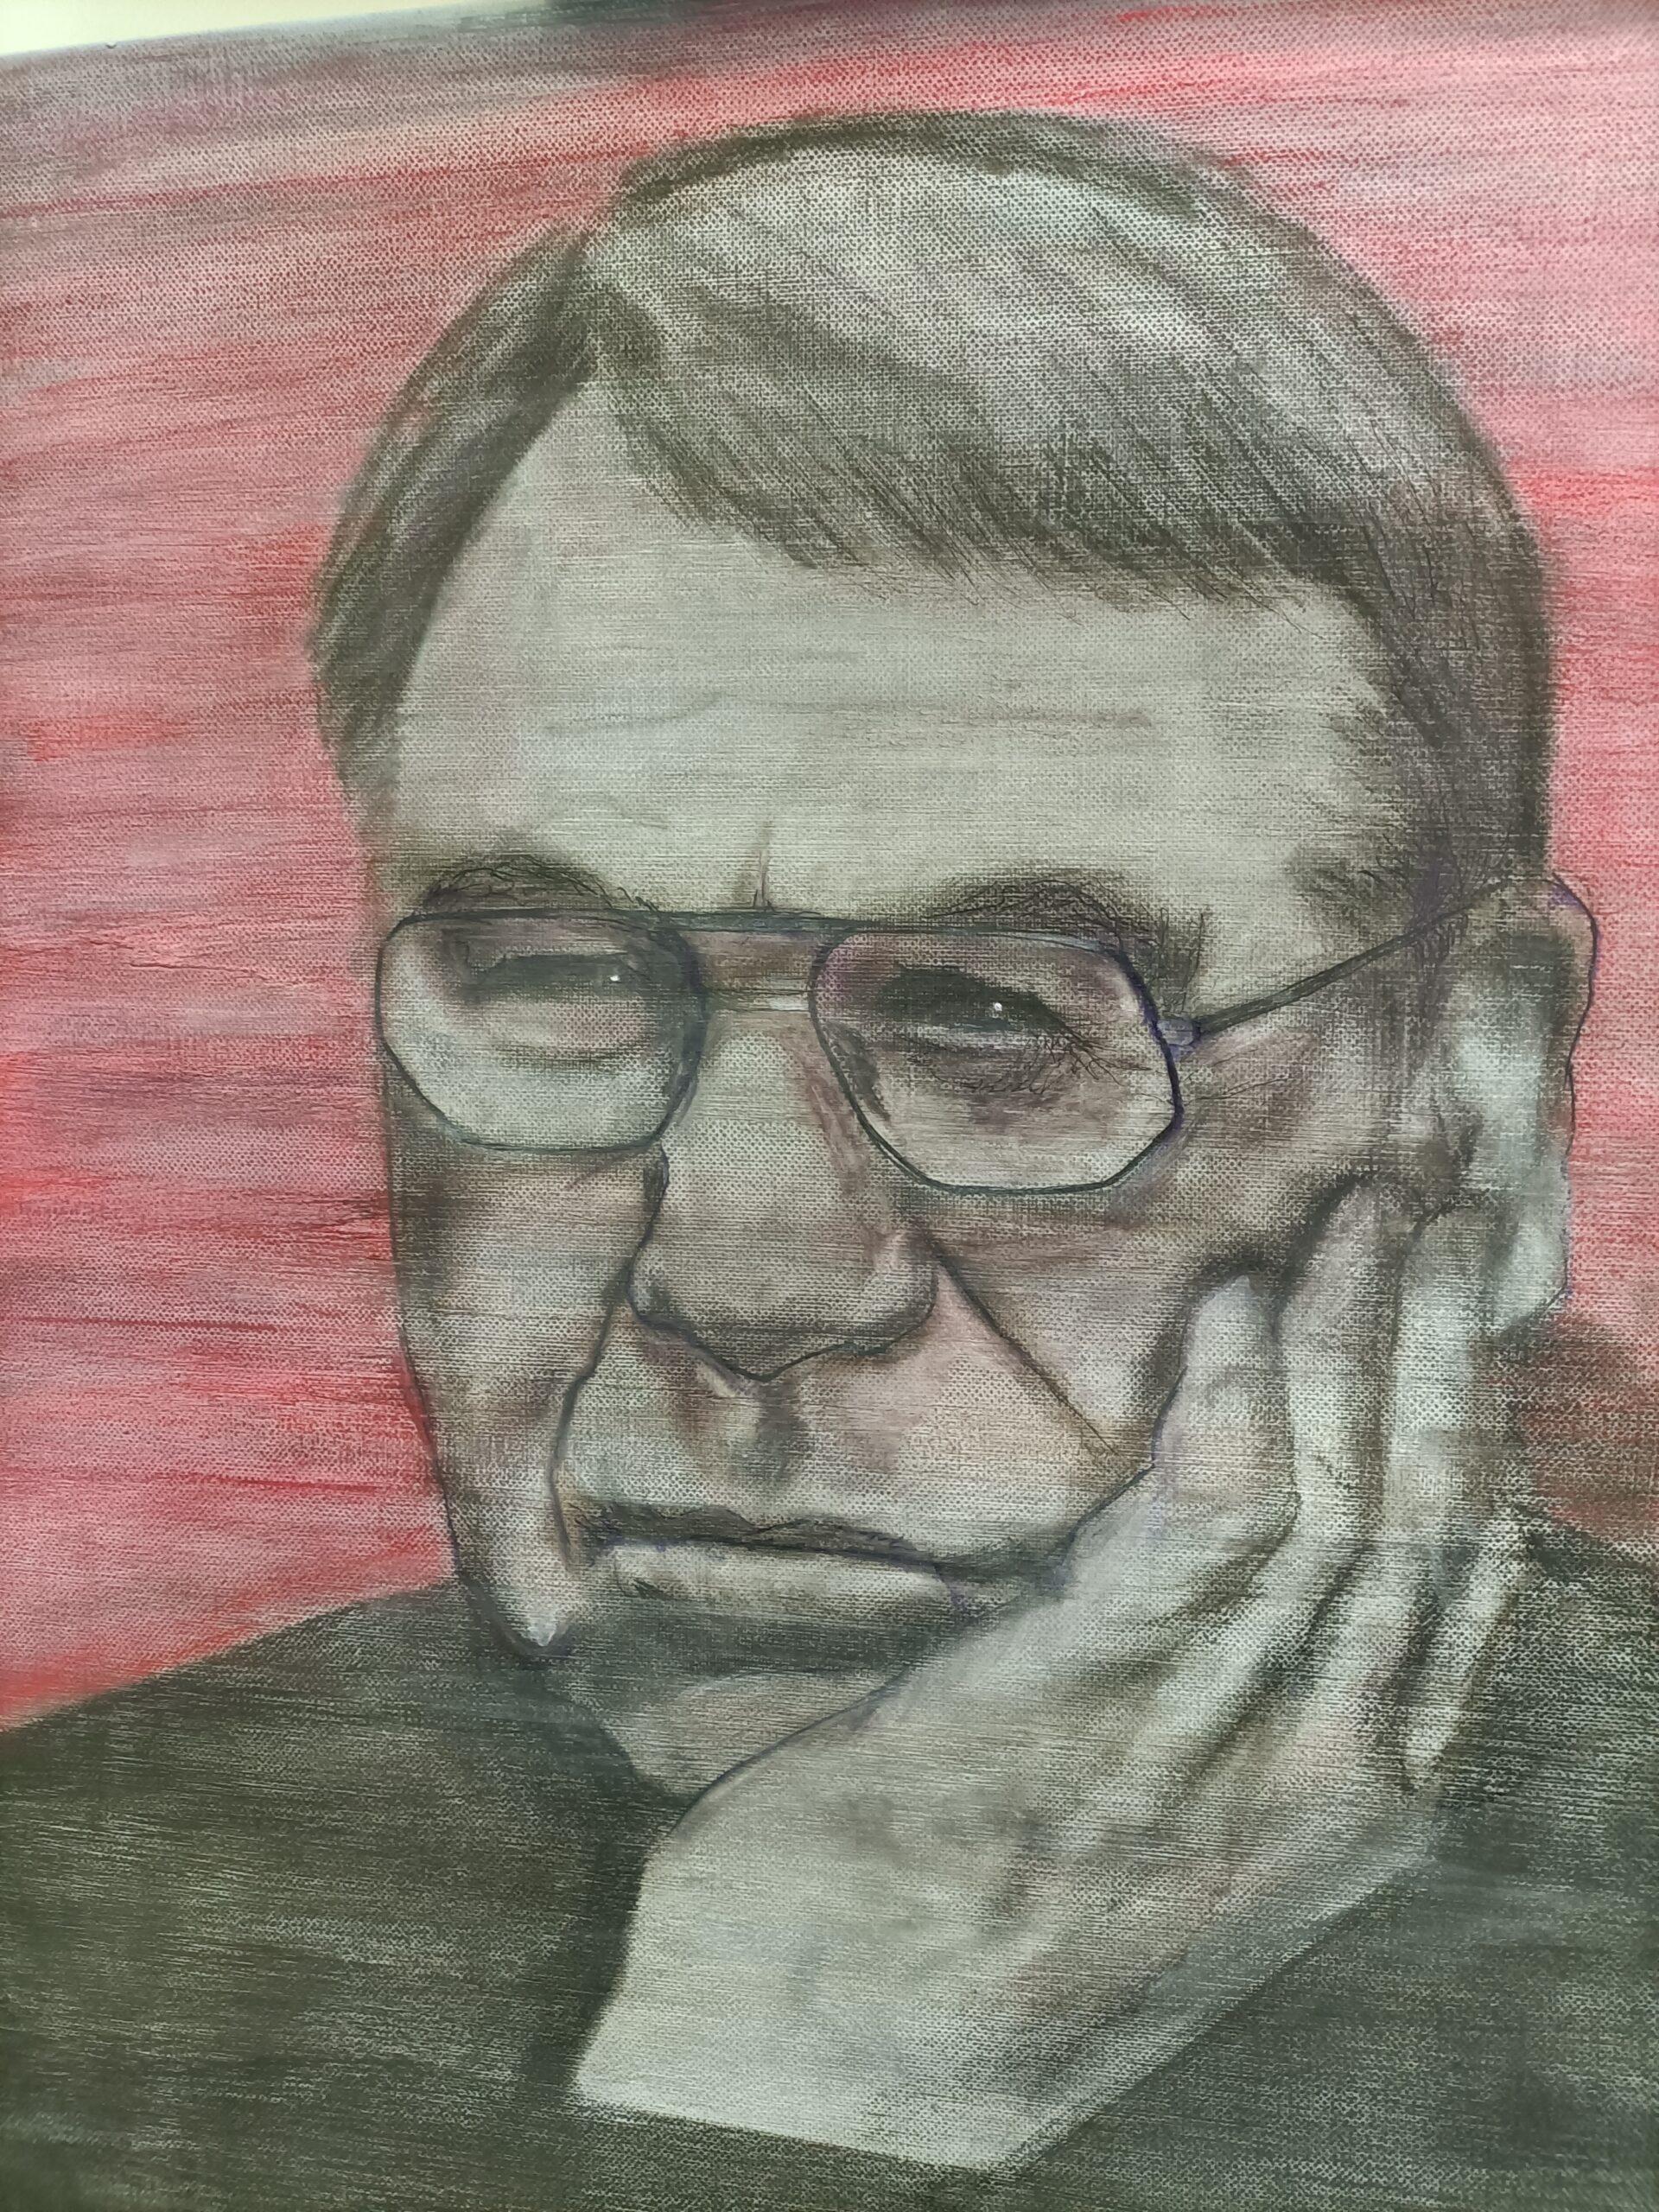 Obraz uczestnika portret